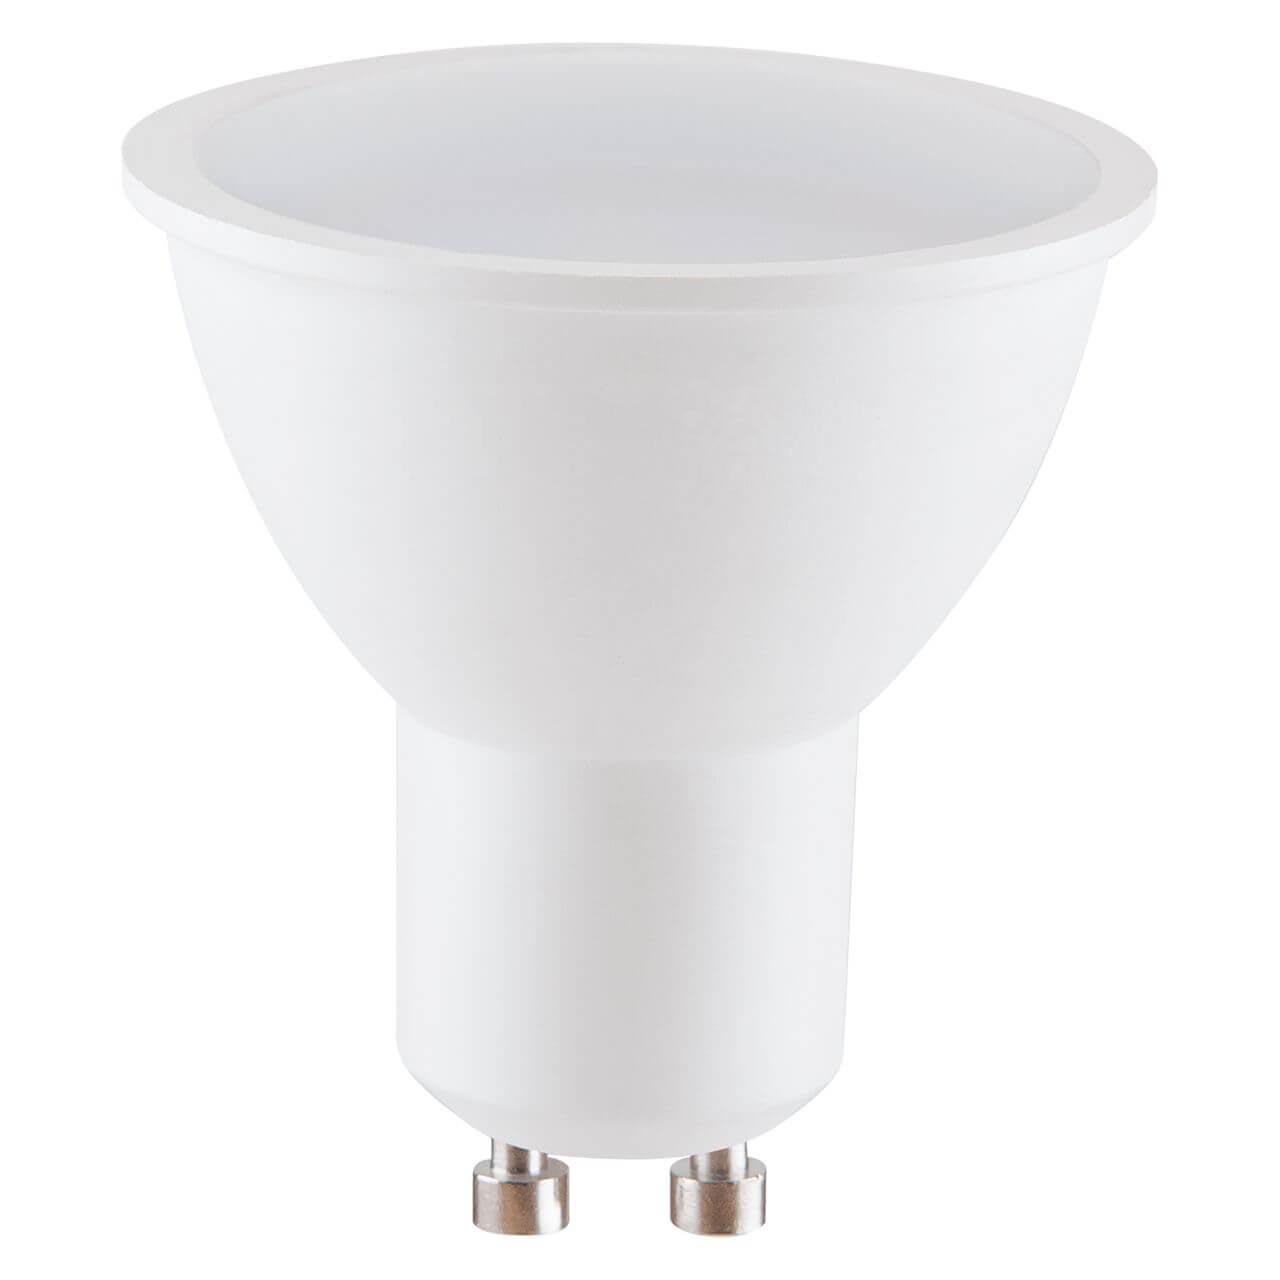 Лампочка Elektrostandard 4690389151675 BLGU10